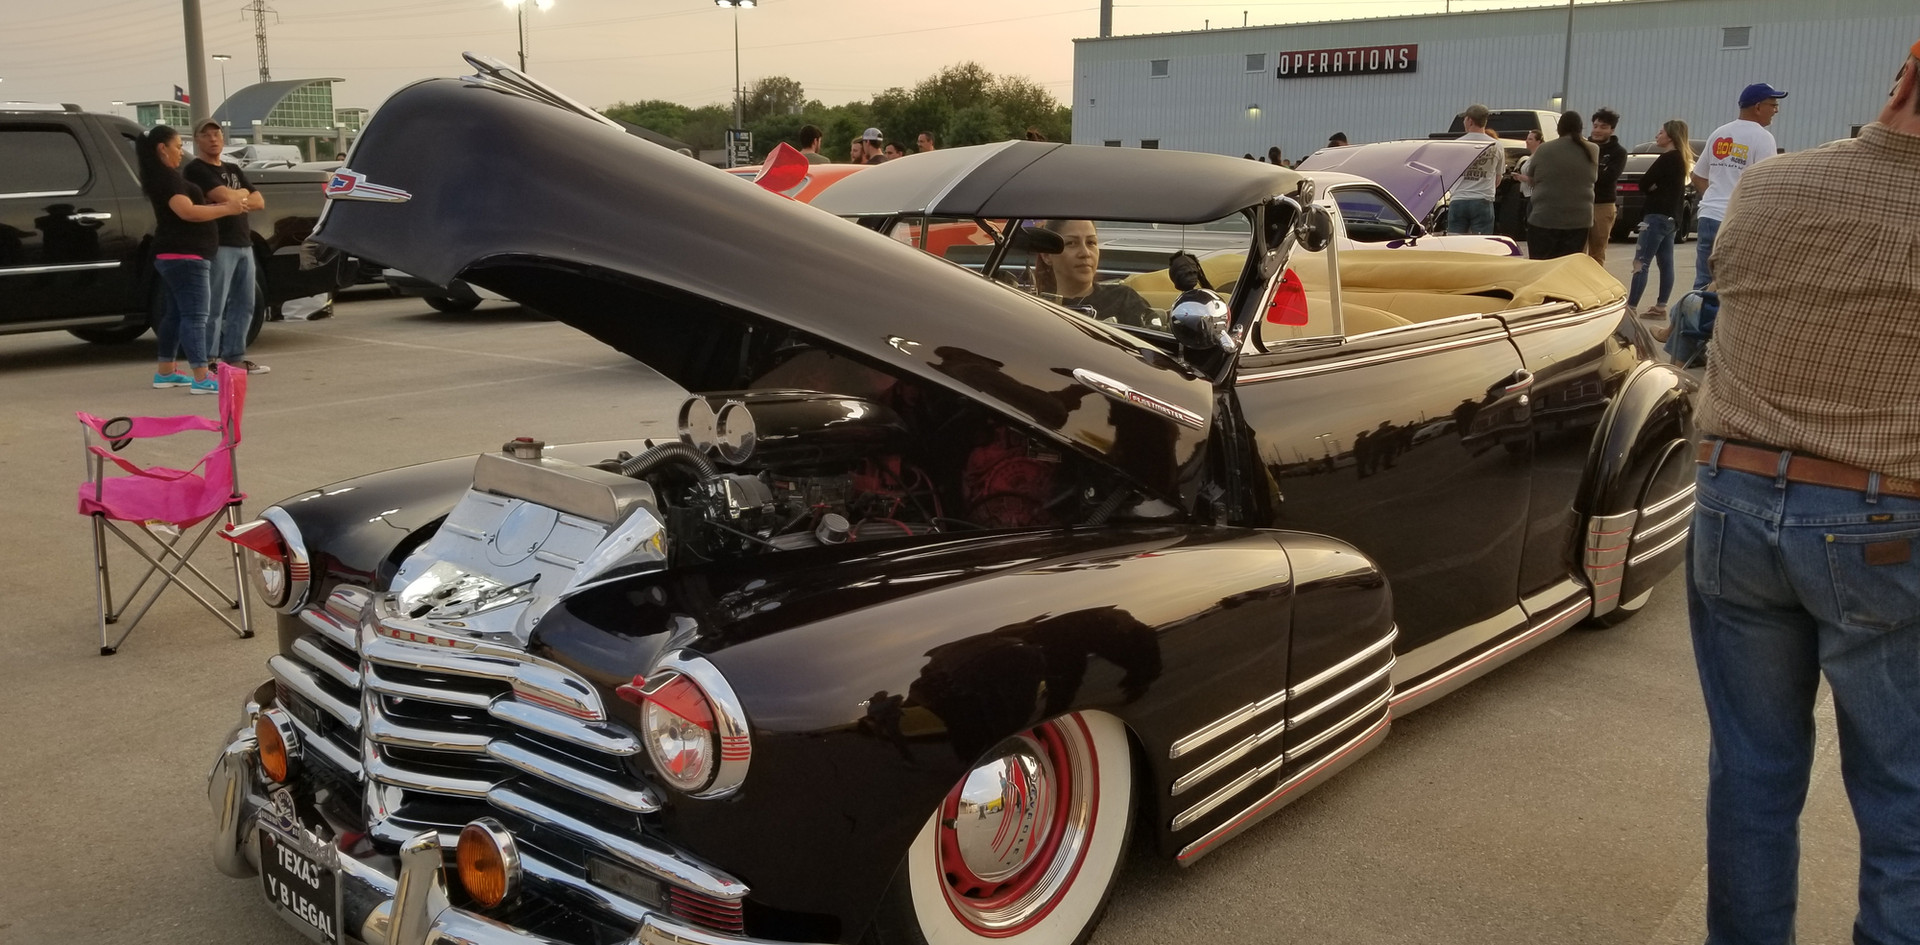 Black Car at FNL